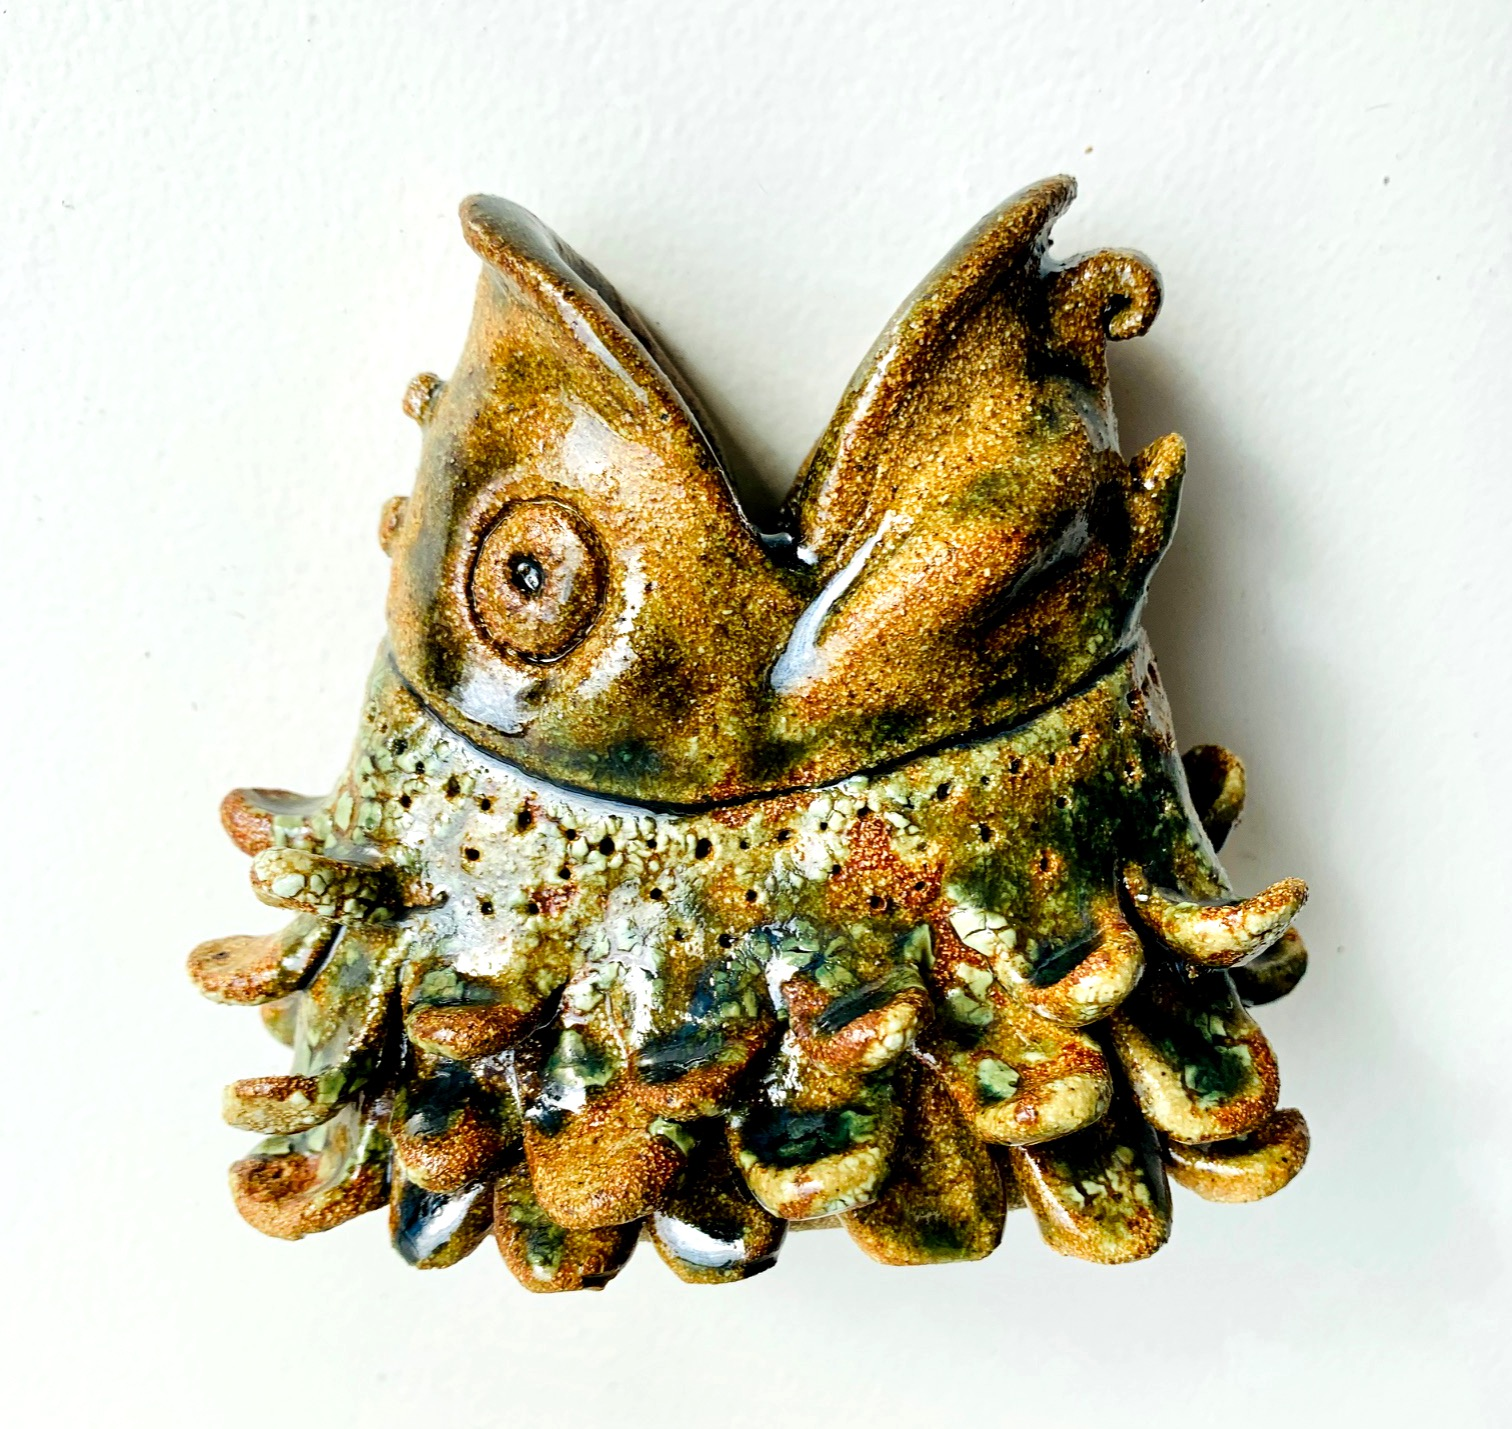 My fish vase